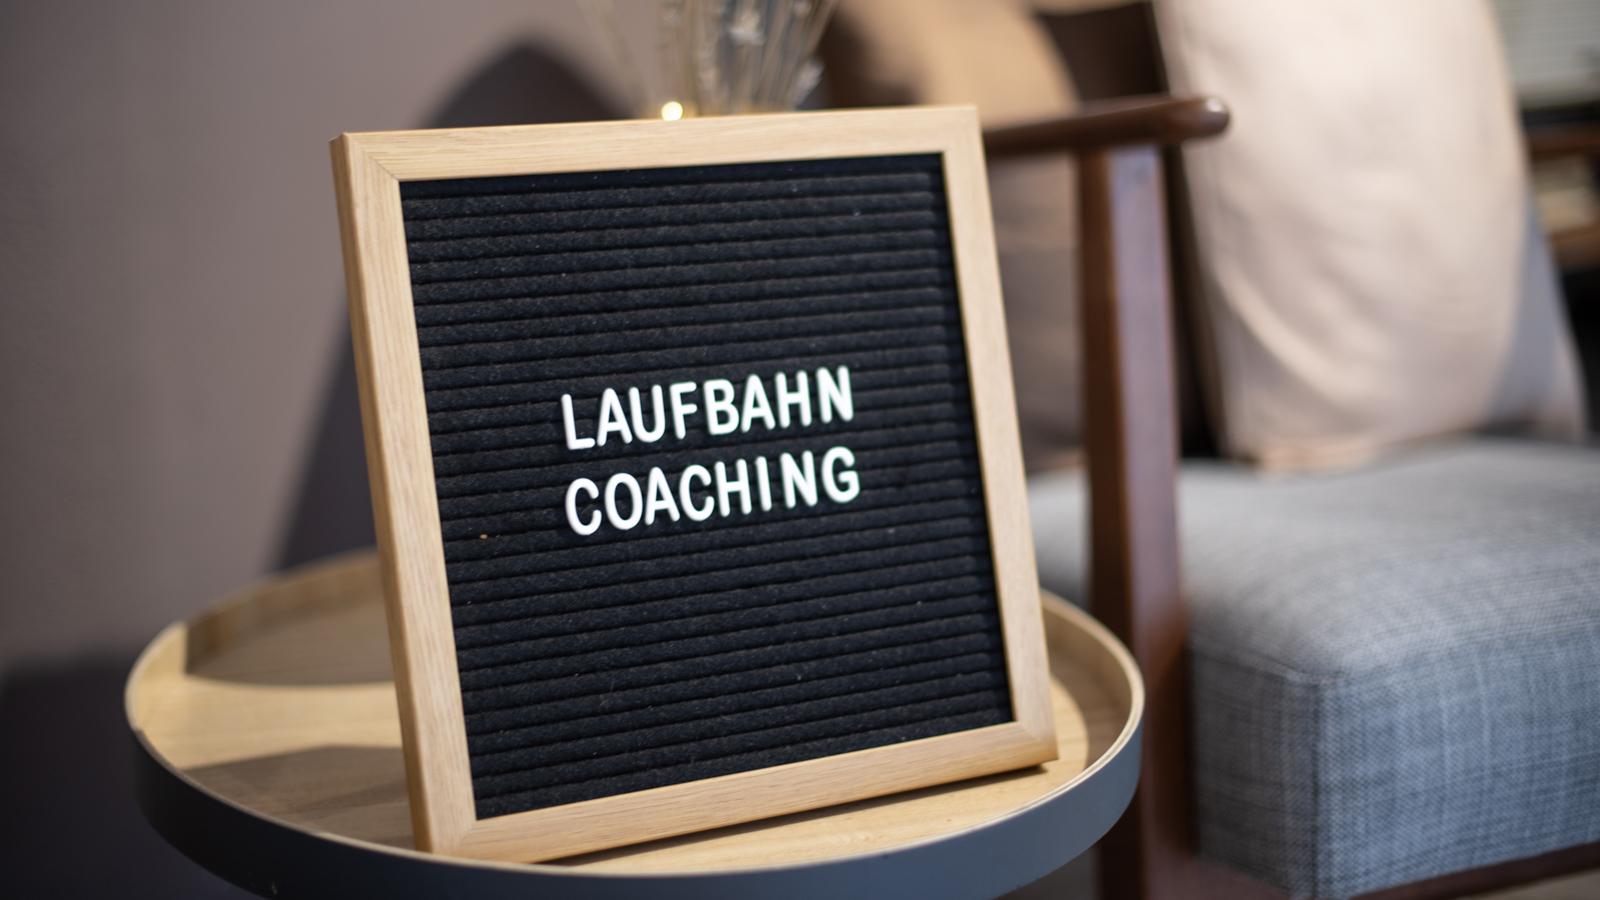 laufbahncoaching_LB_01_s